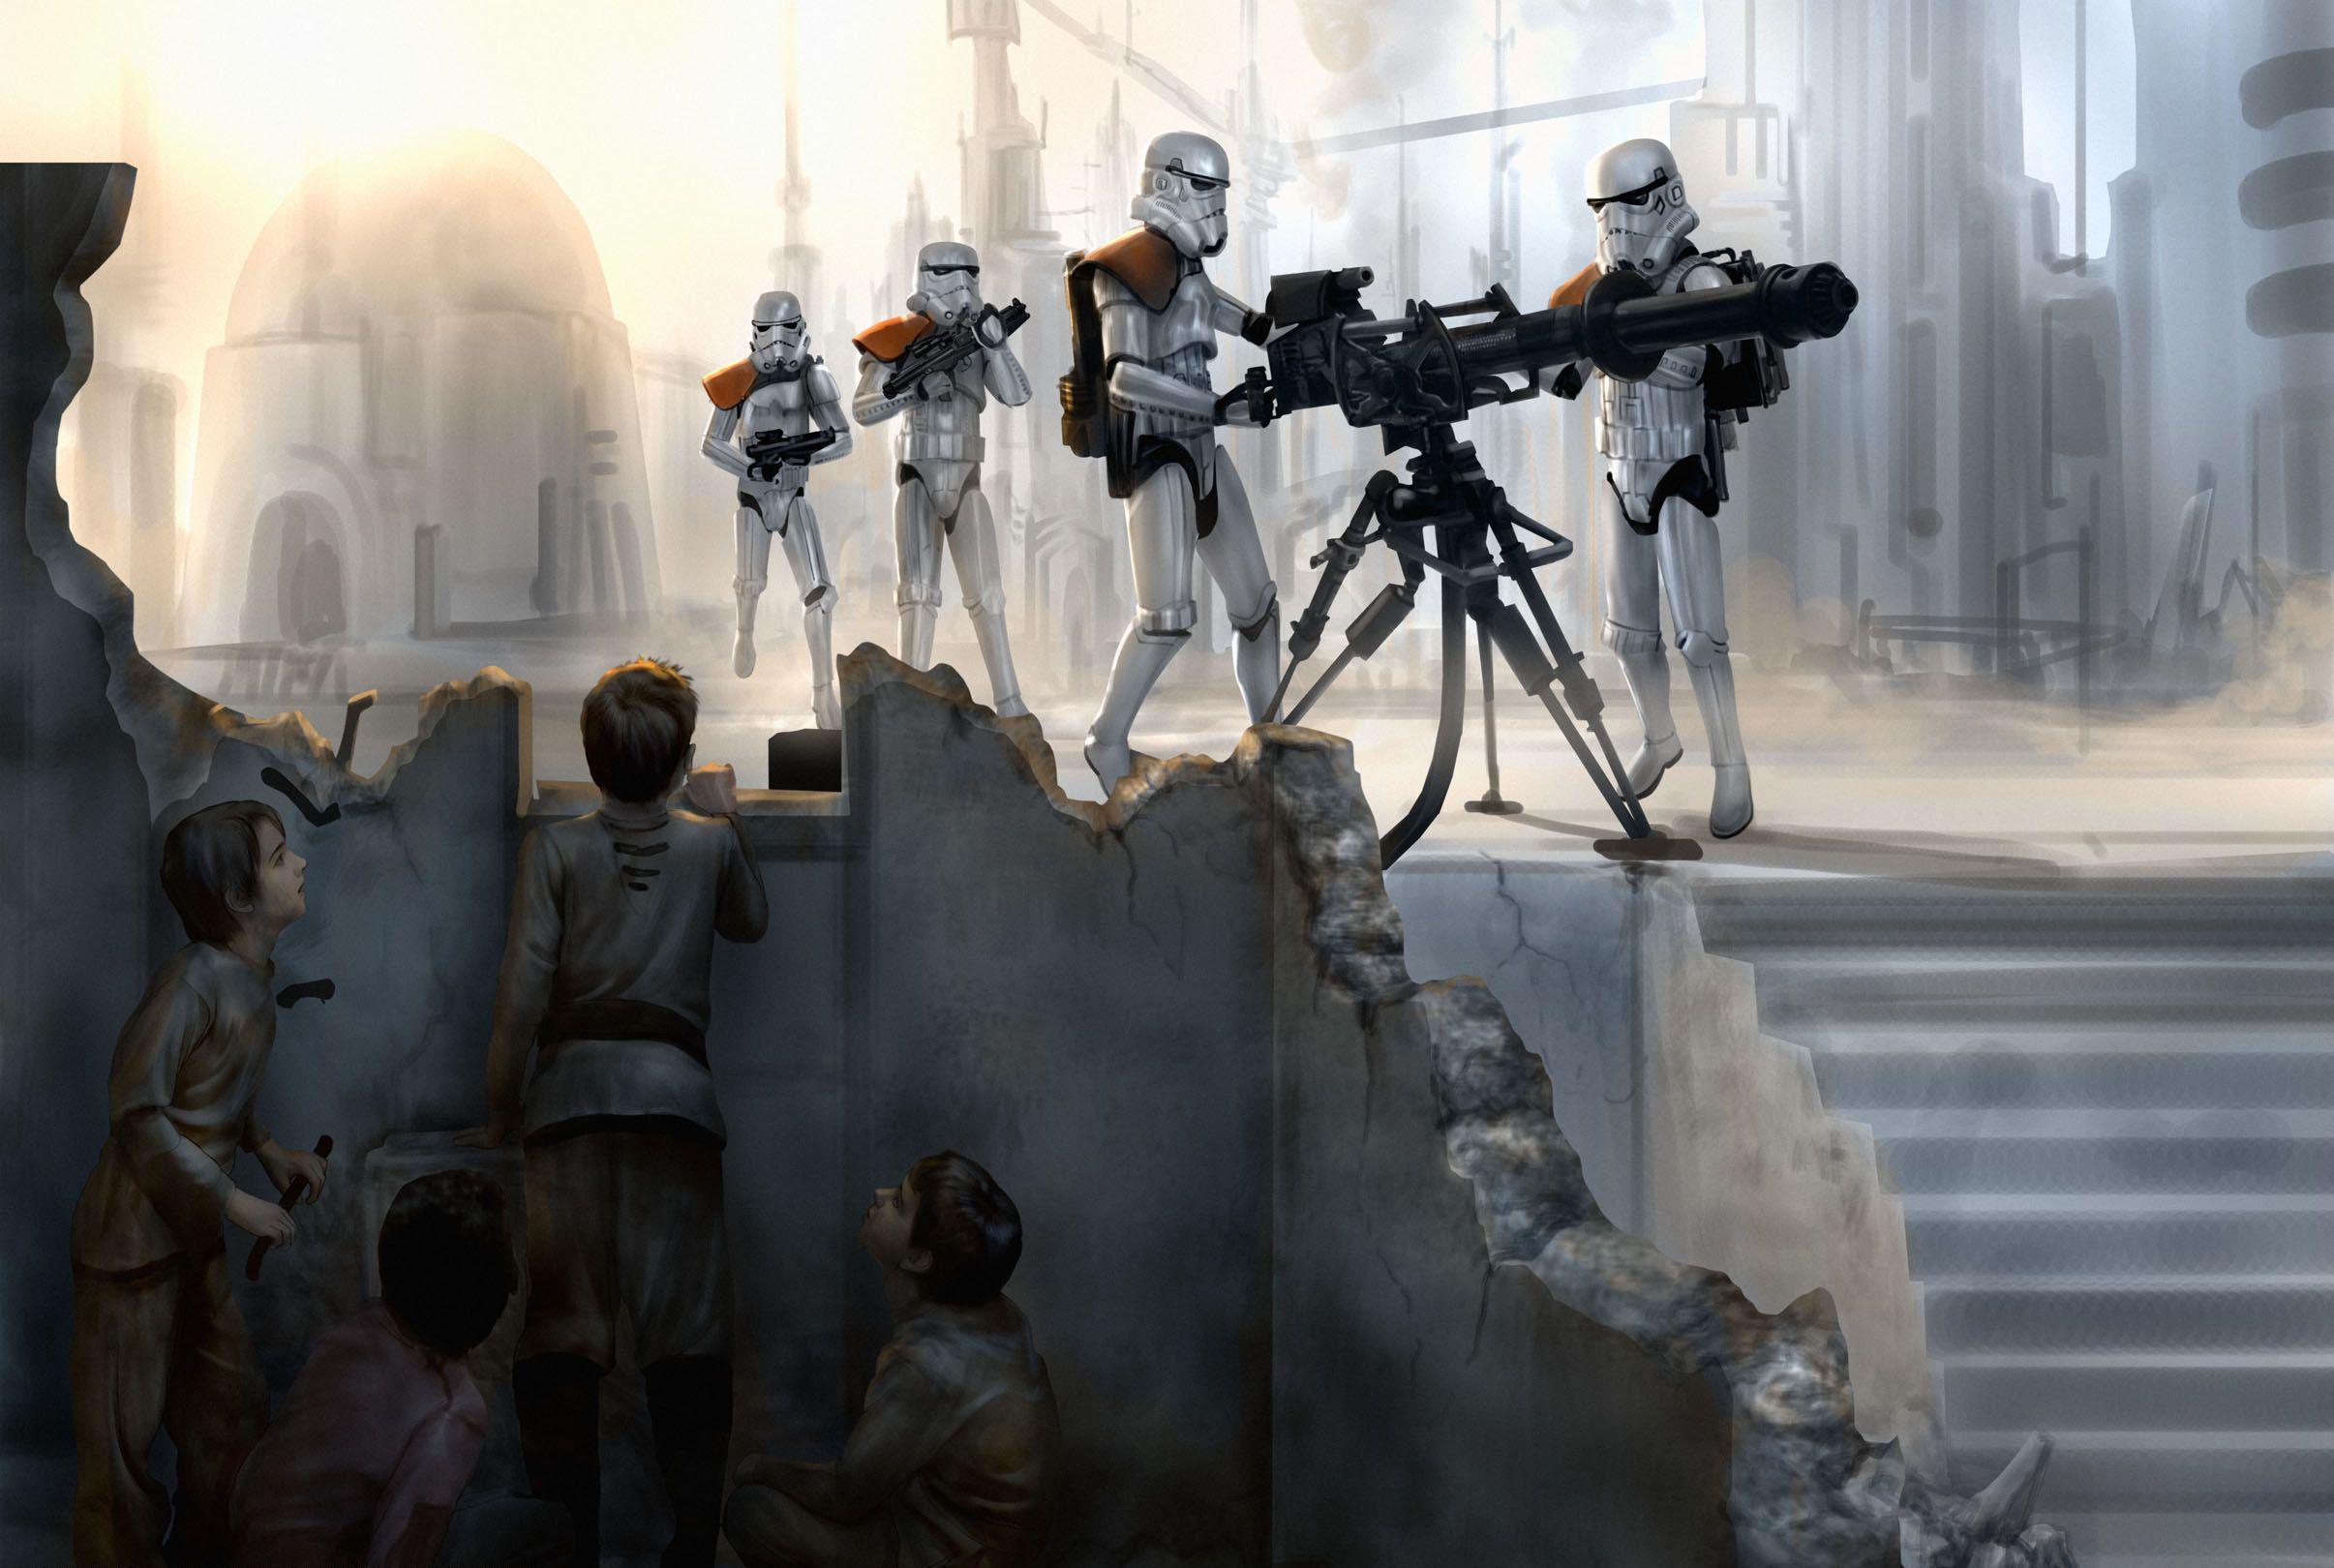 Galactic Empire Star Wars Wallpaper Star Wars Art Star Wars Images